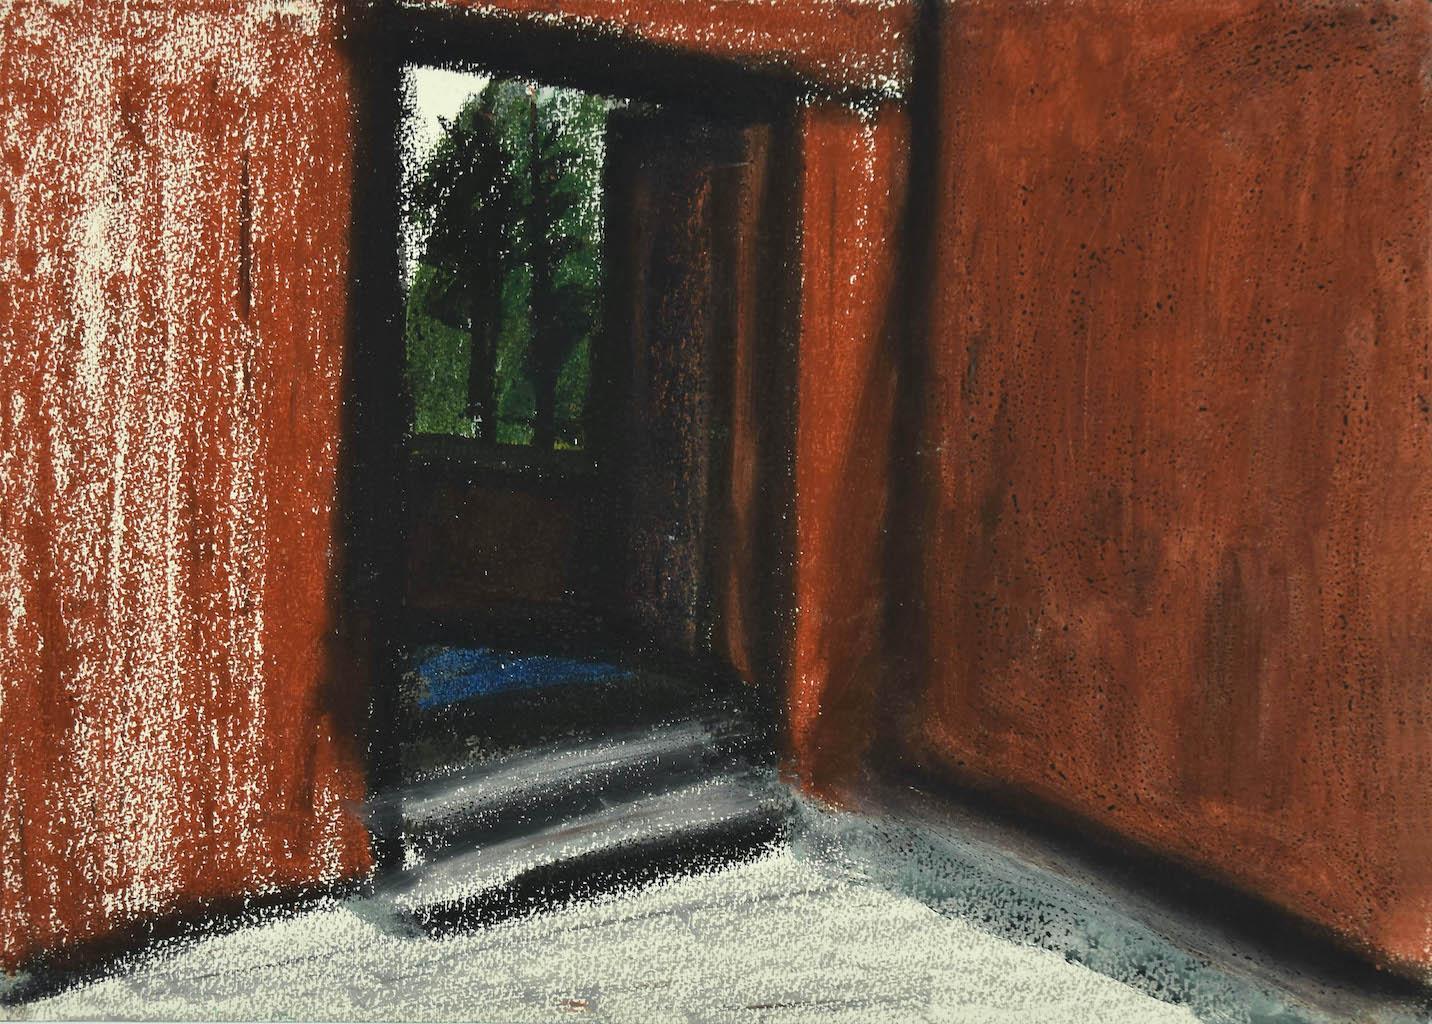 House - Original Mixed Media on Cardboard by Sun Jingyuan - 1970s